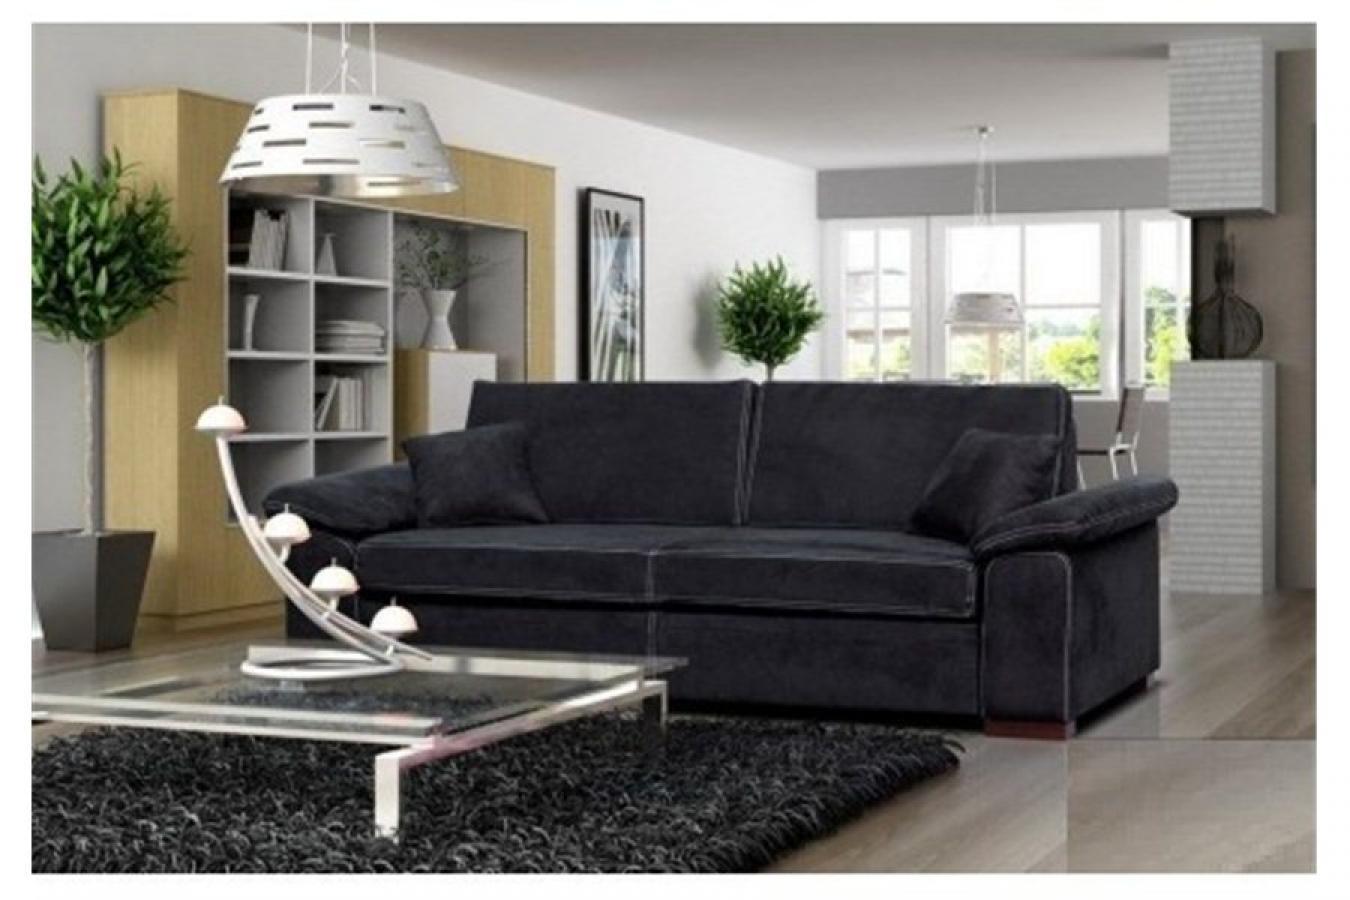 photos canap microfibre. Black Bedroom Furniture Sets. Home Design Ideas